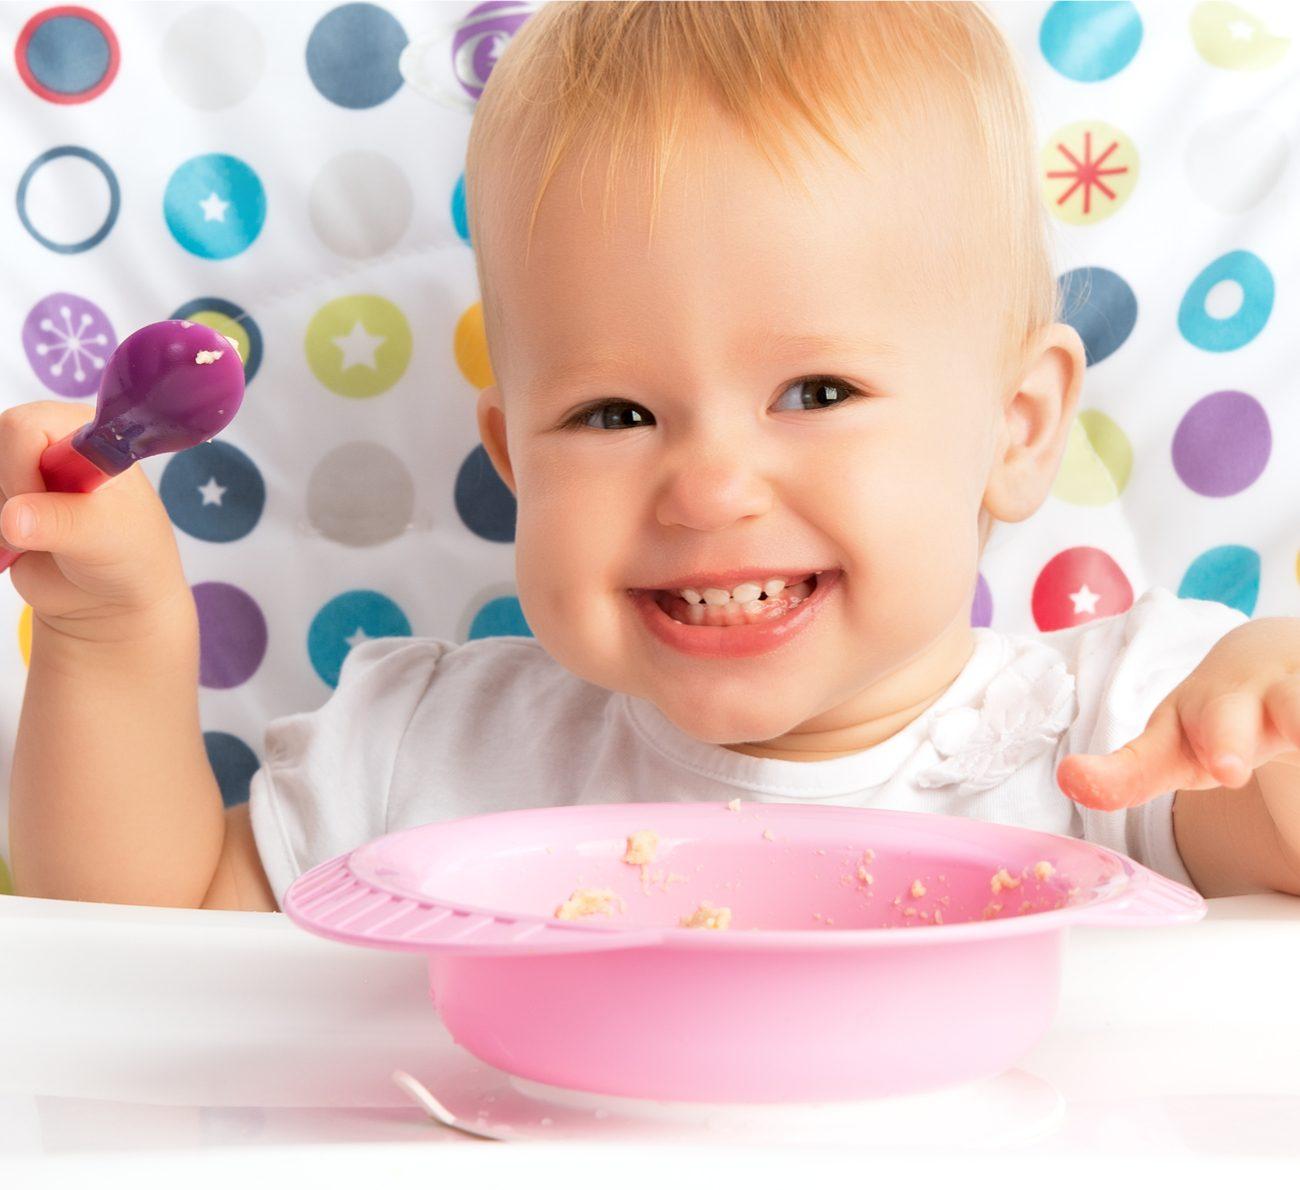 bebê pode comer frutos do mar